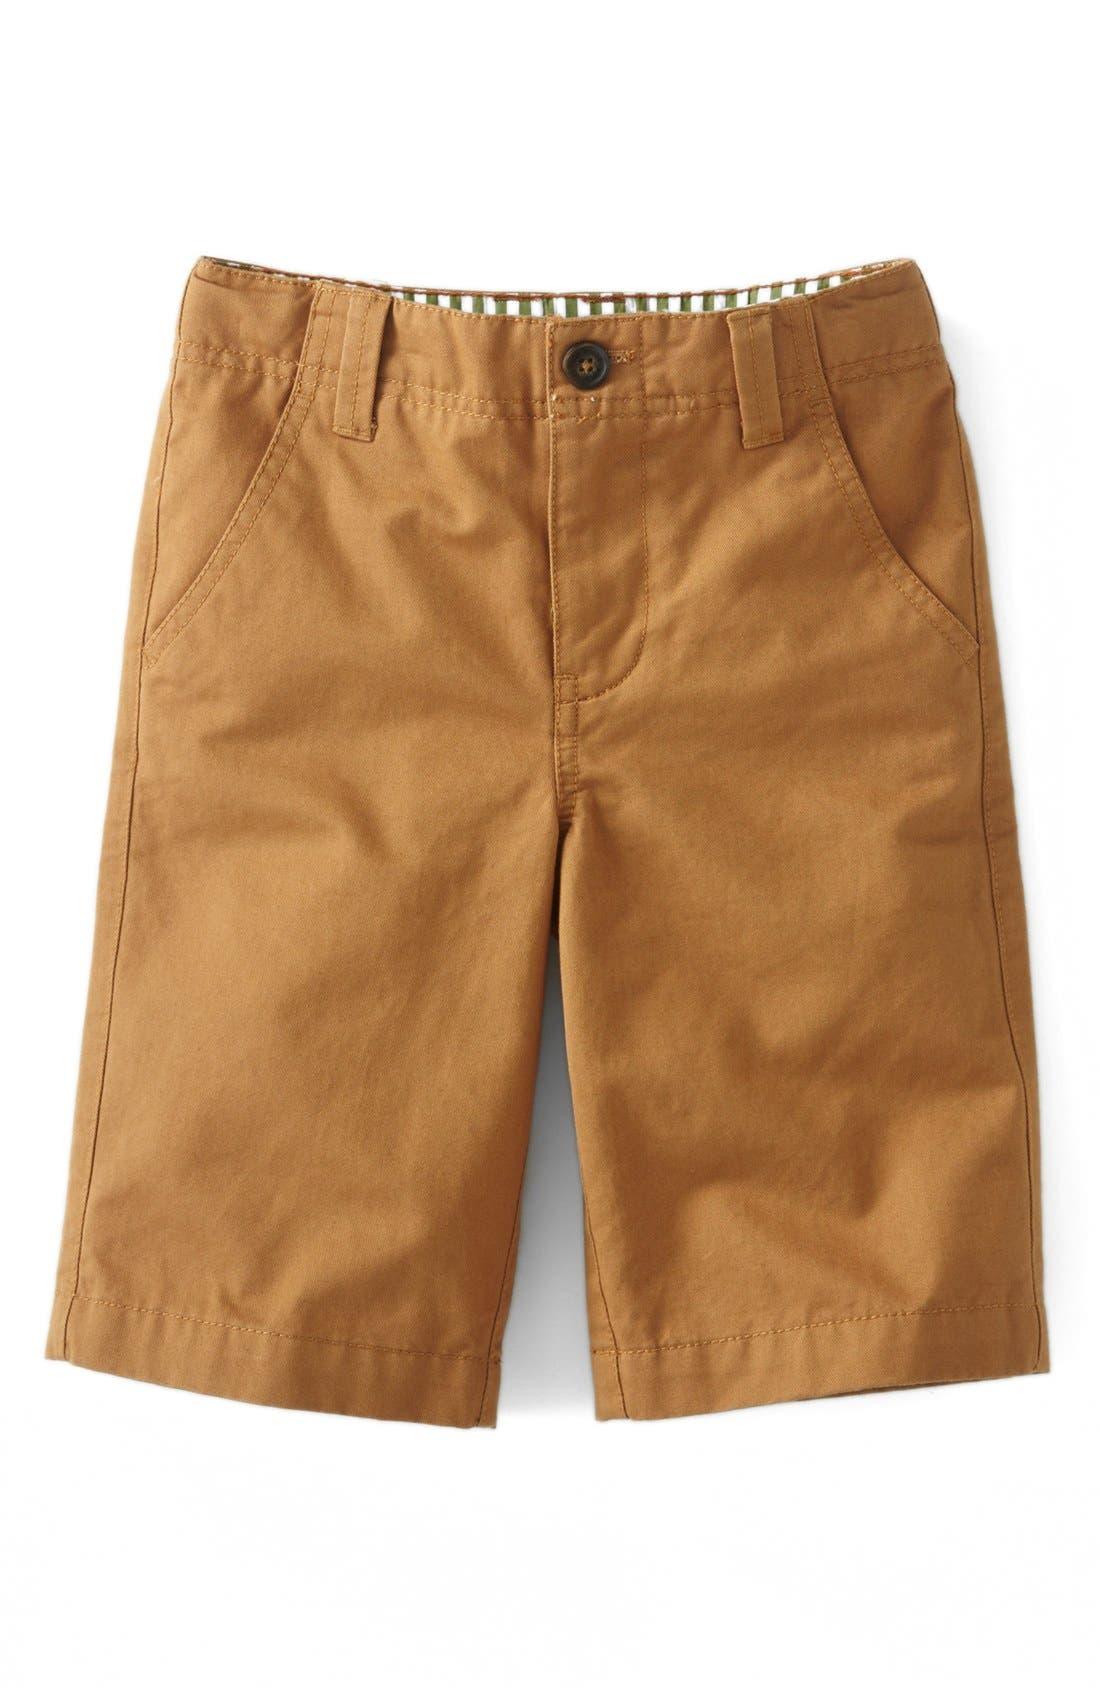 Alternate Image 1 Selected - Mini Boden Chino Shorts (Toddler Boys, Little Boys & Big Boys)